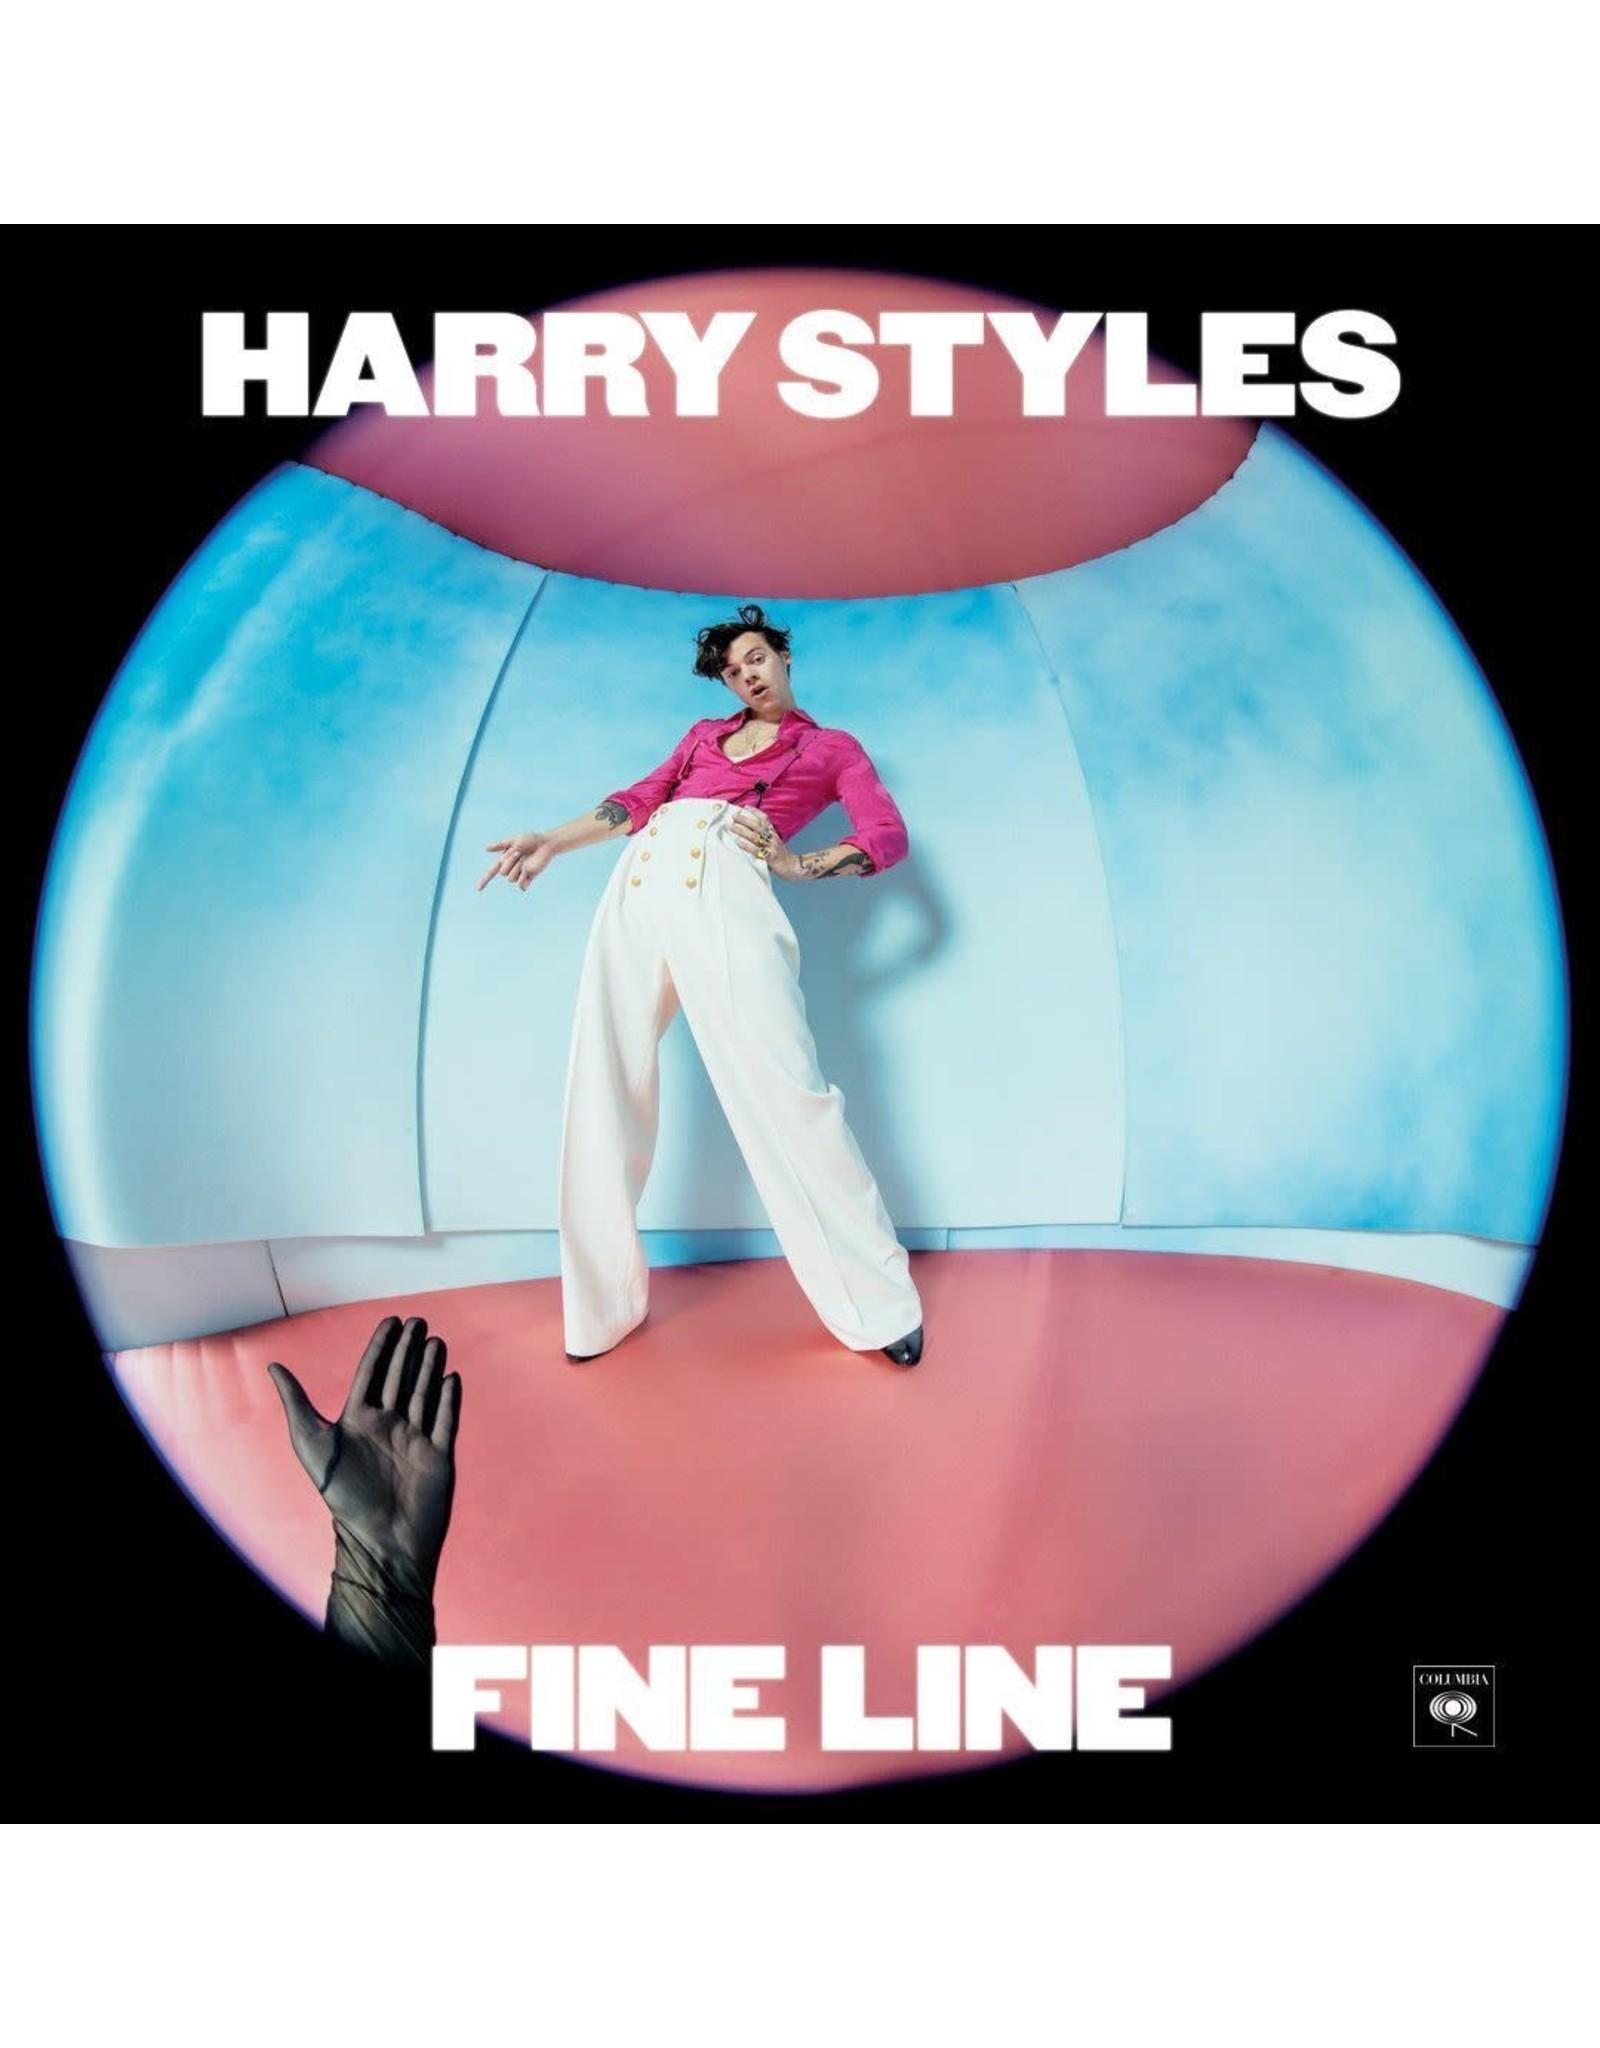 Styles, Harry - Fine Line LP